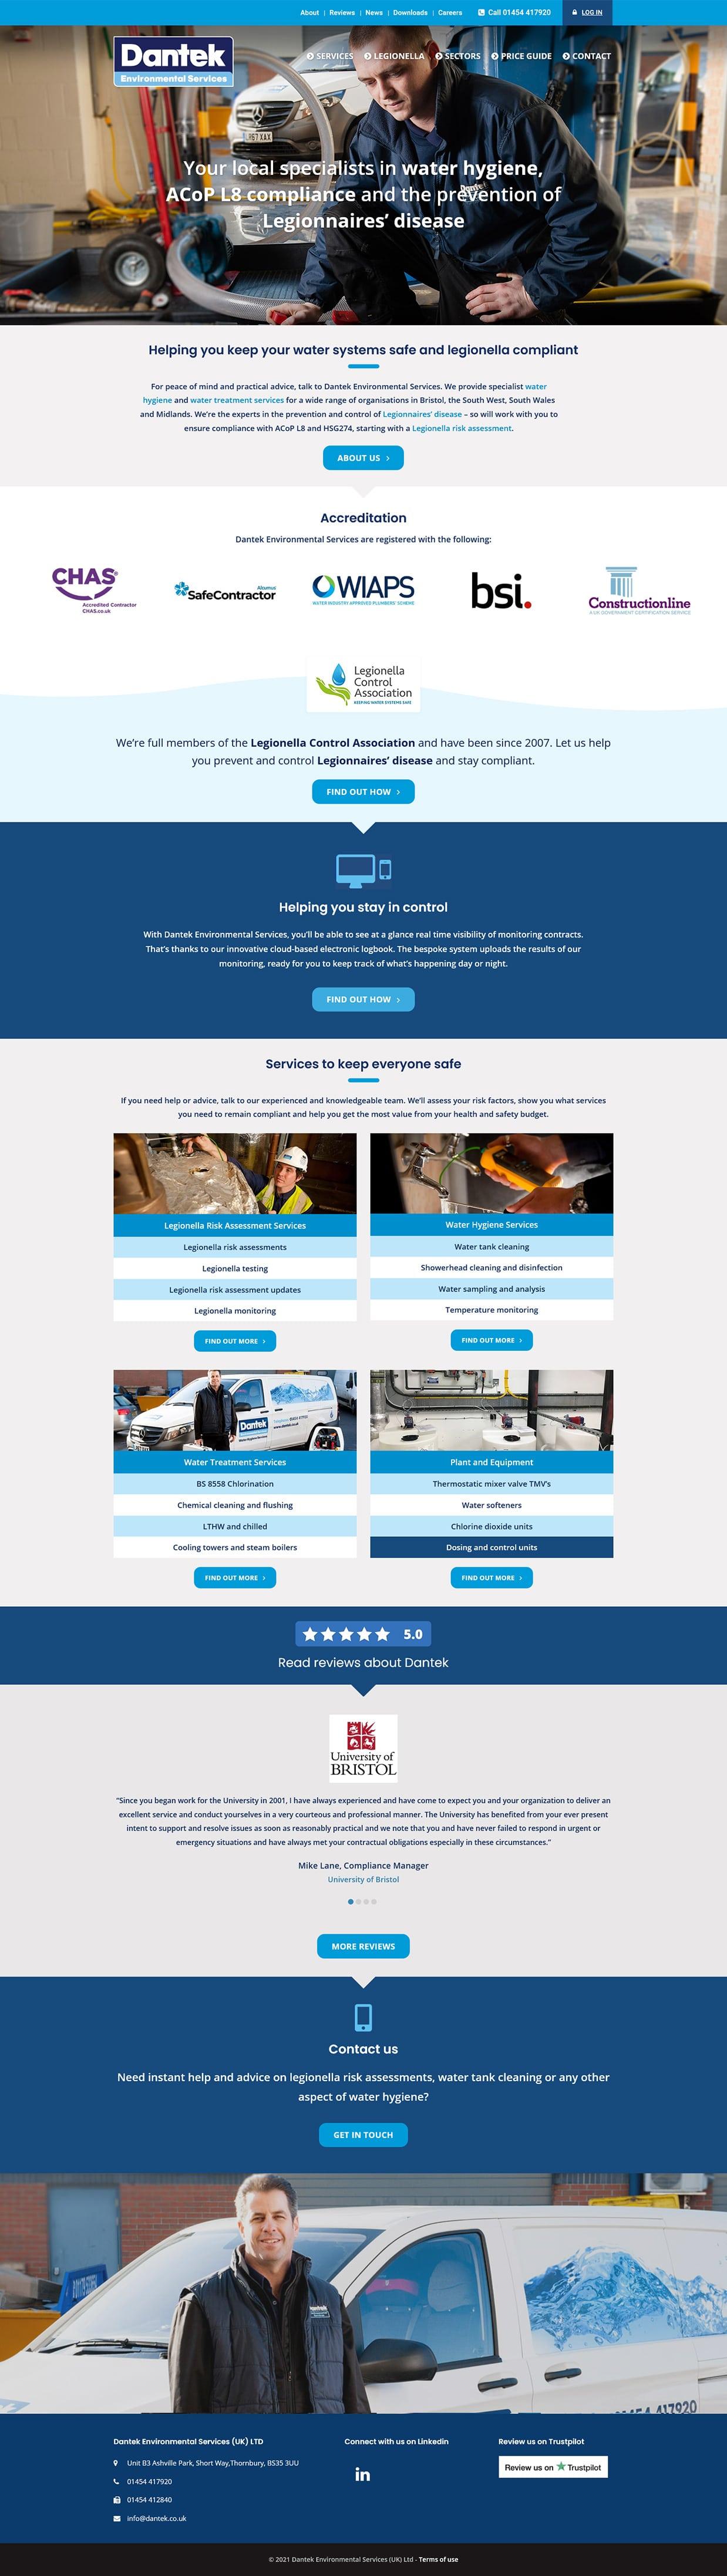 Website screenshot - Dantek